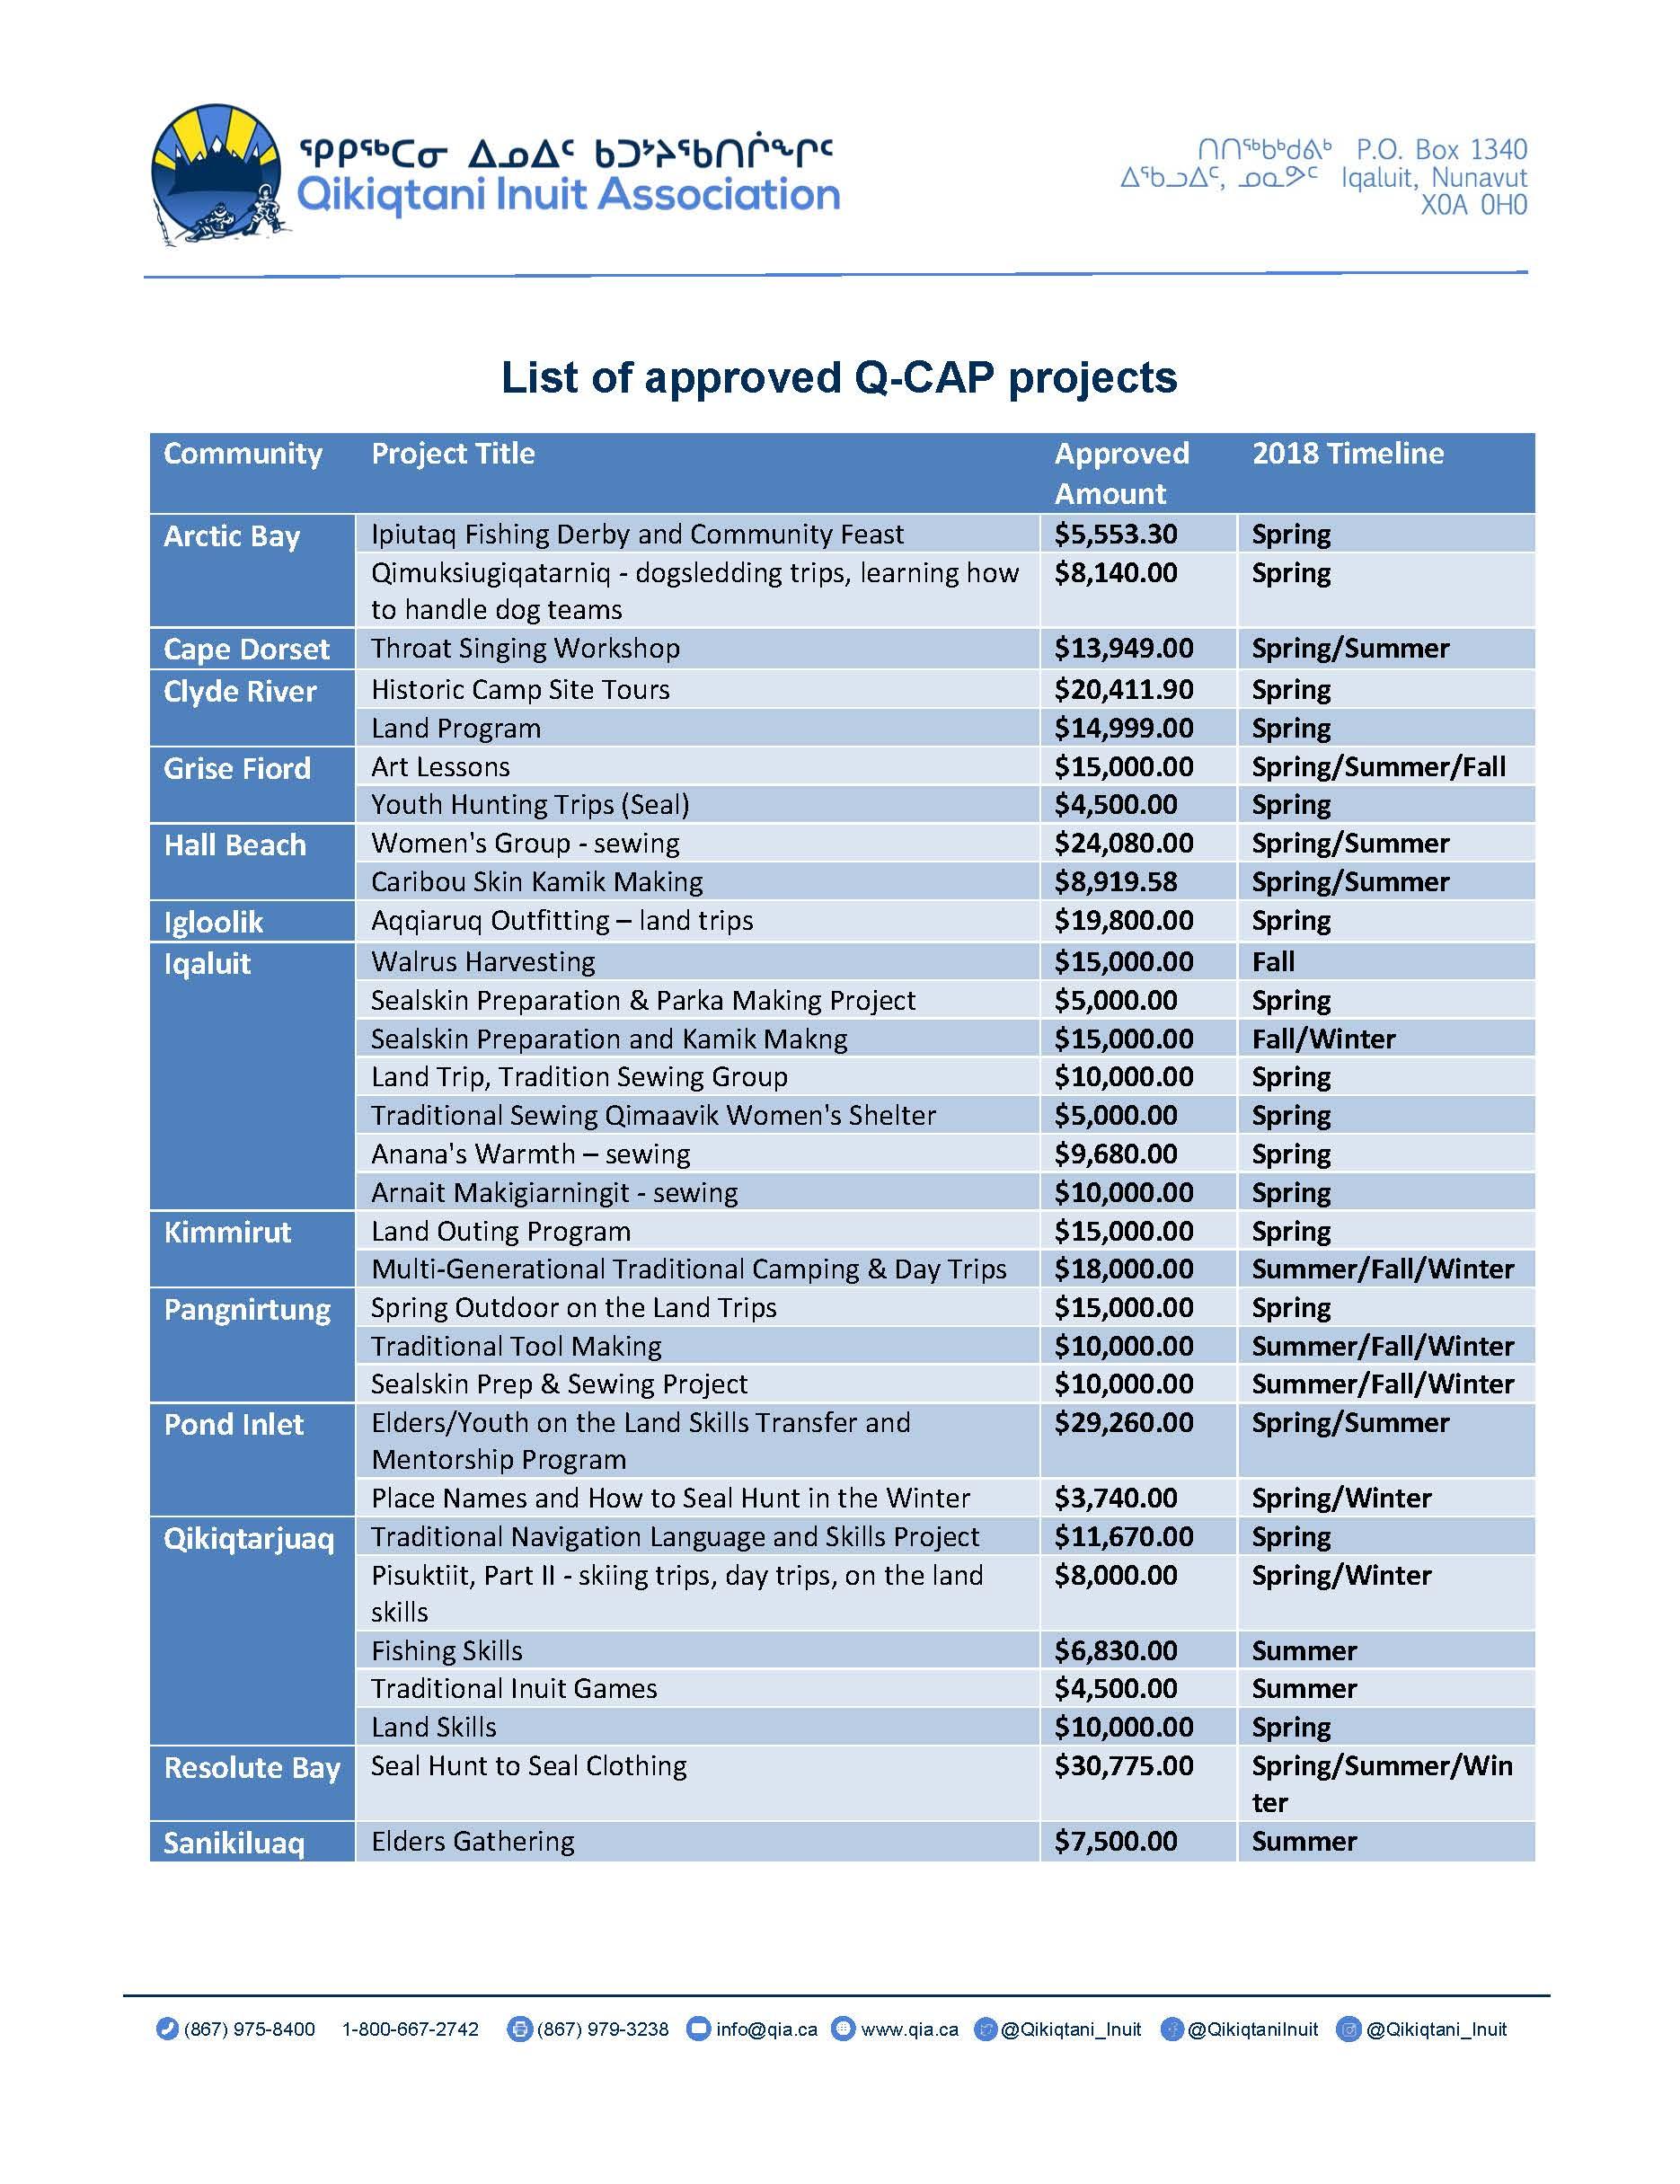 QIA announces 31 new QCAP projects: Qikiqtani Cultural